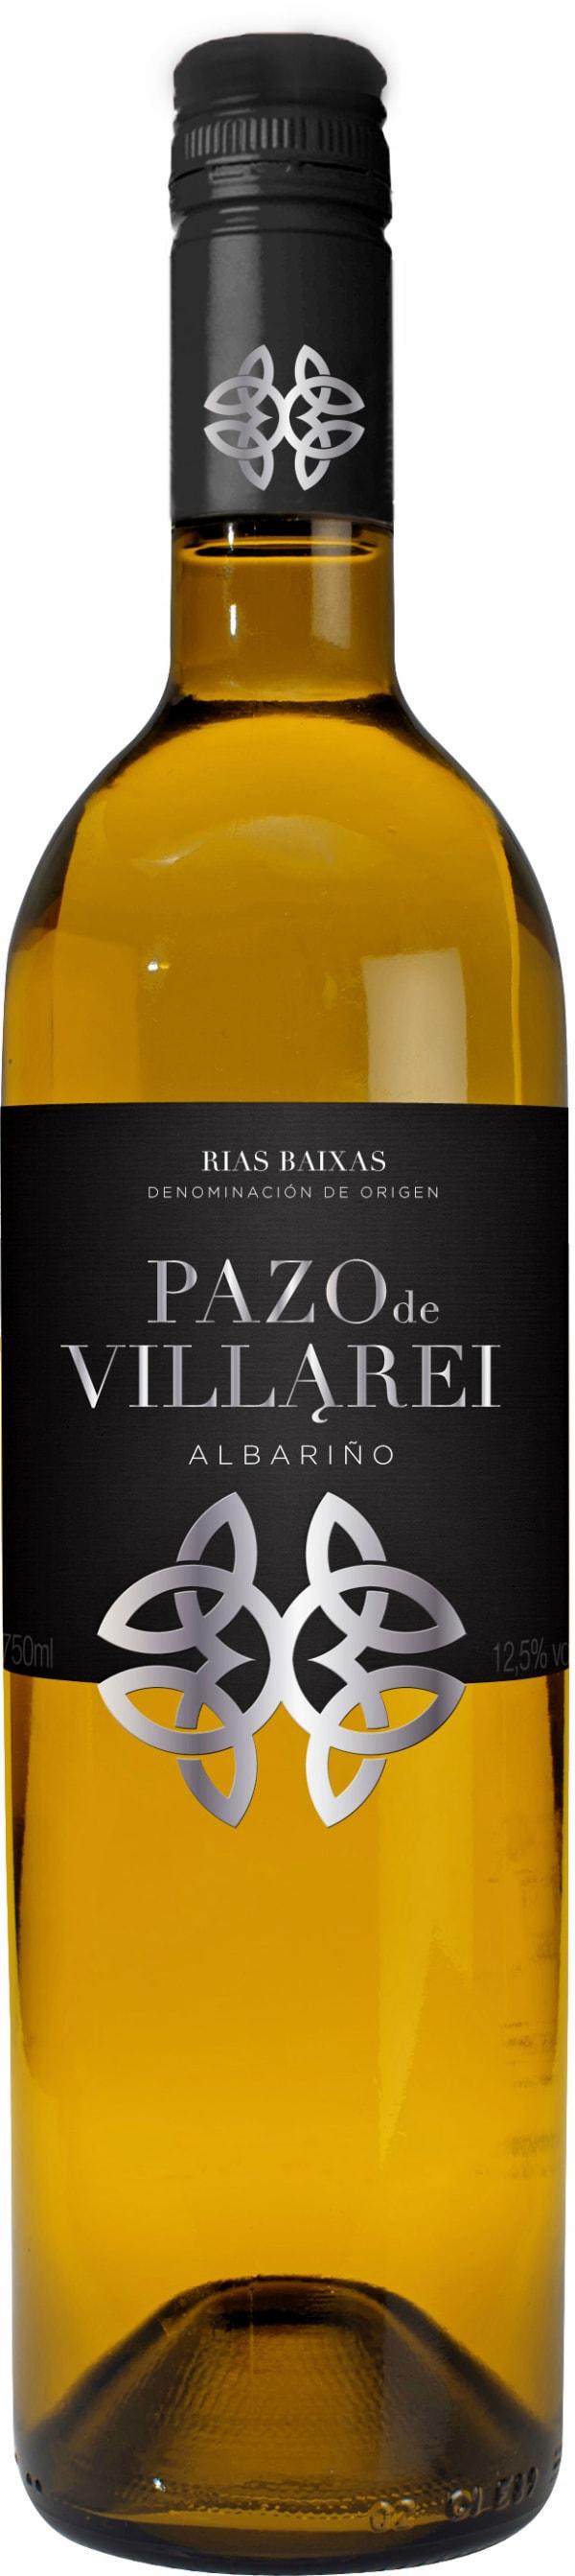 Pazo de Villarei Albariño 2018